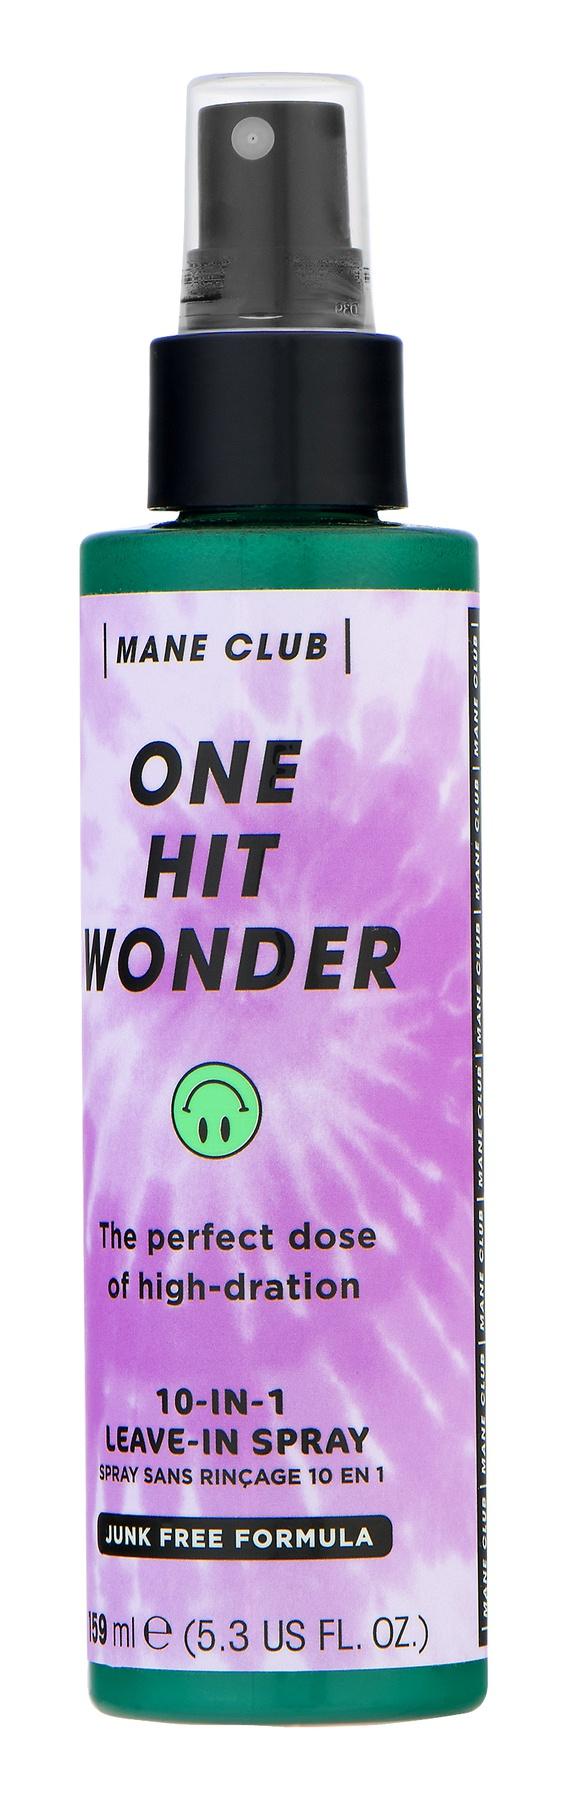 Mane Club One Hit Wonder